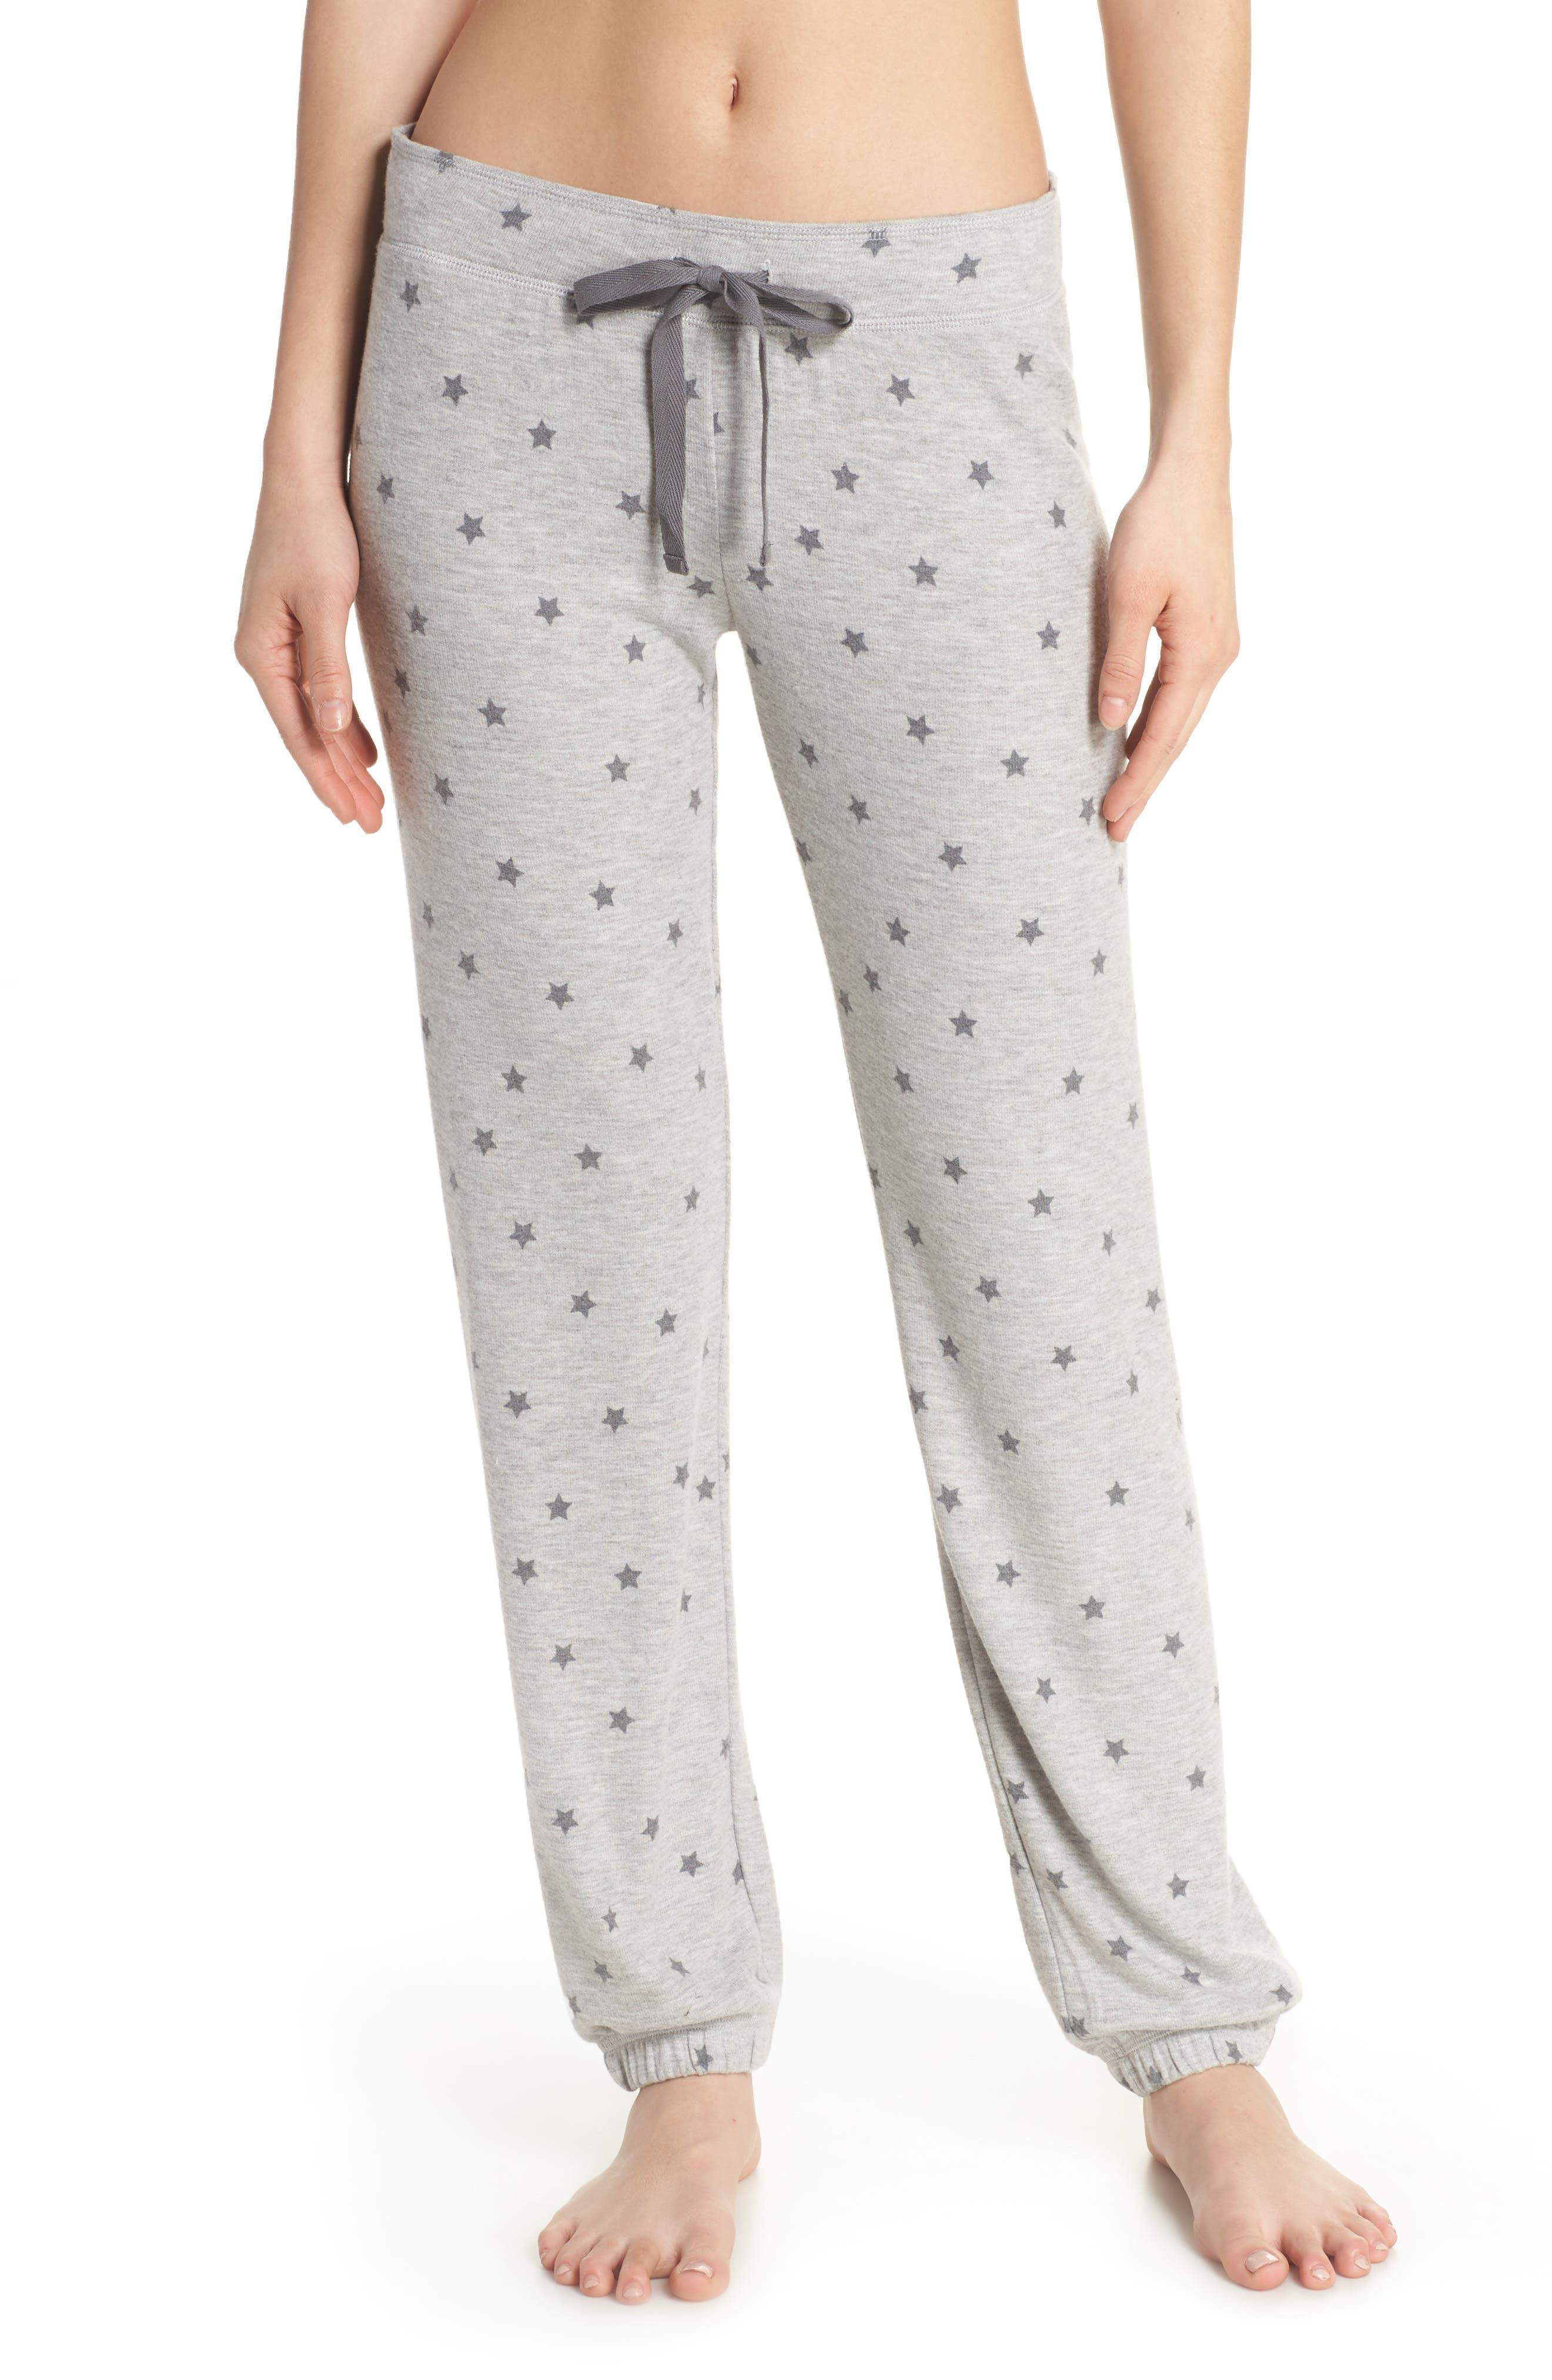 Peachy Pajama Pants,                         Main,                         color, 020